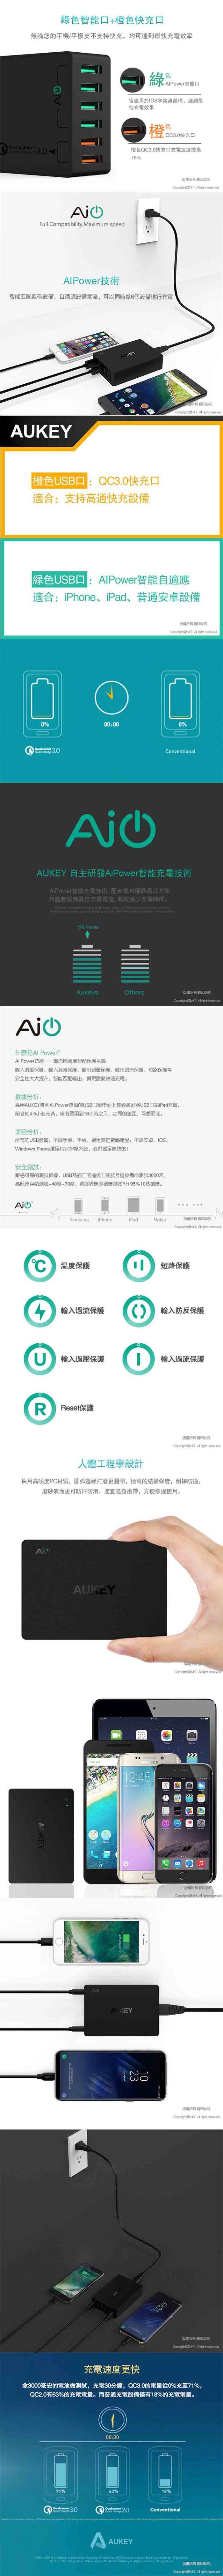 AUKEY|PA-T11 60W QC3.0 6孔快速充電器